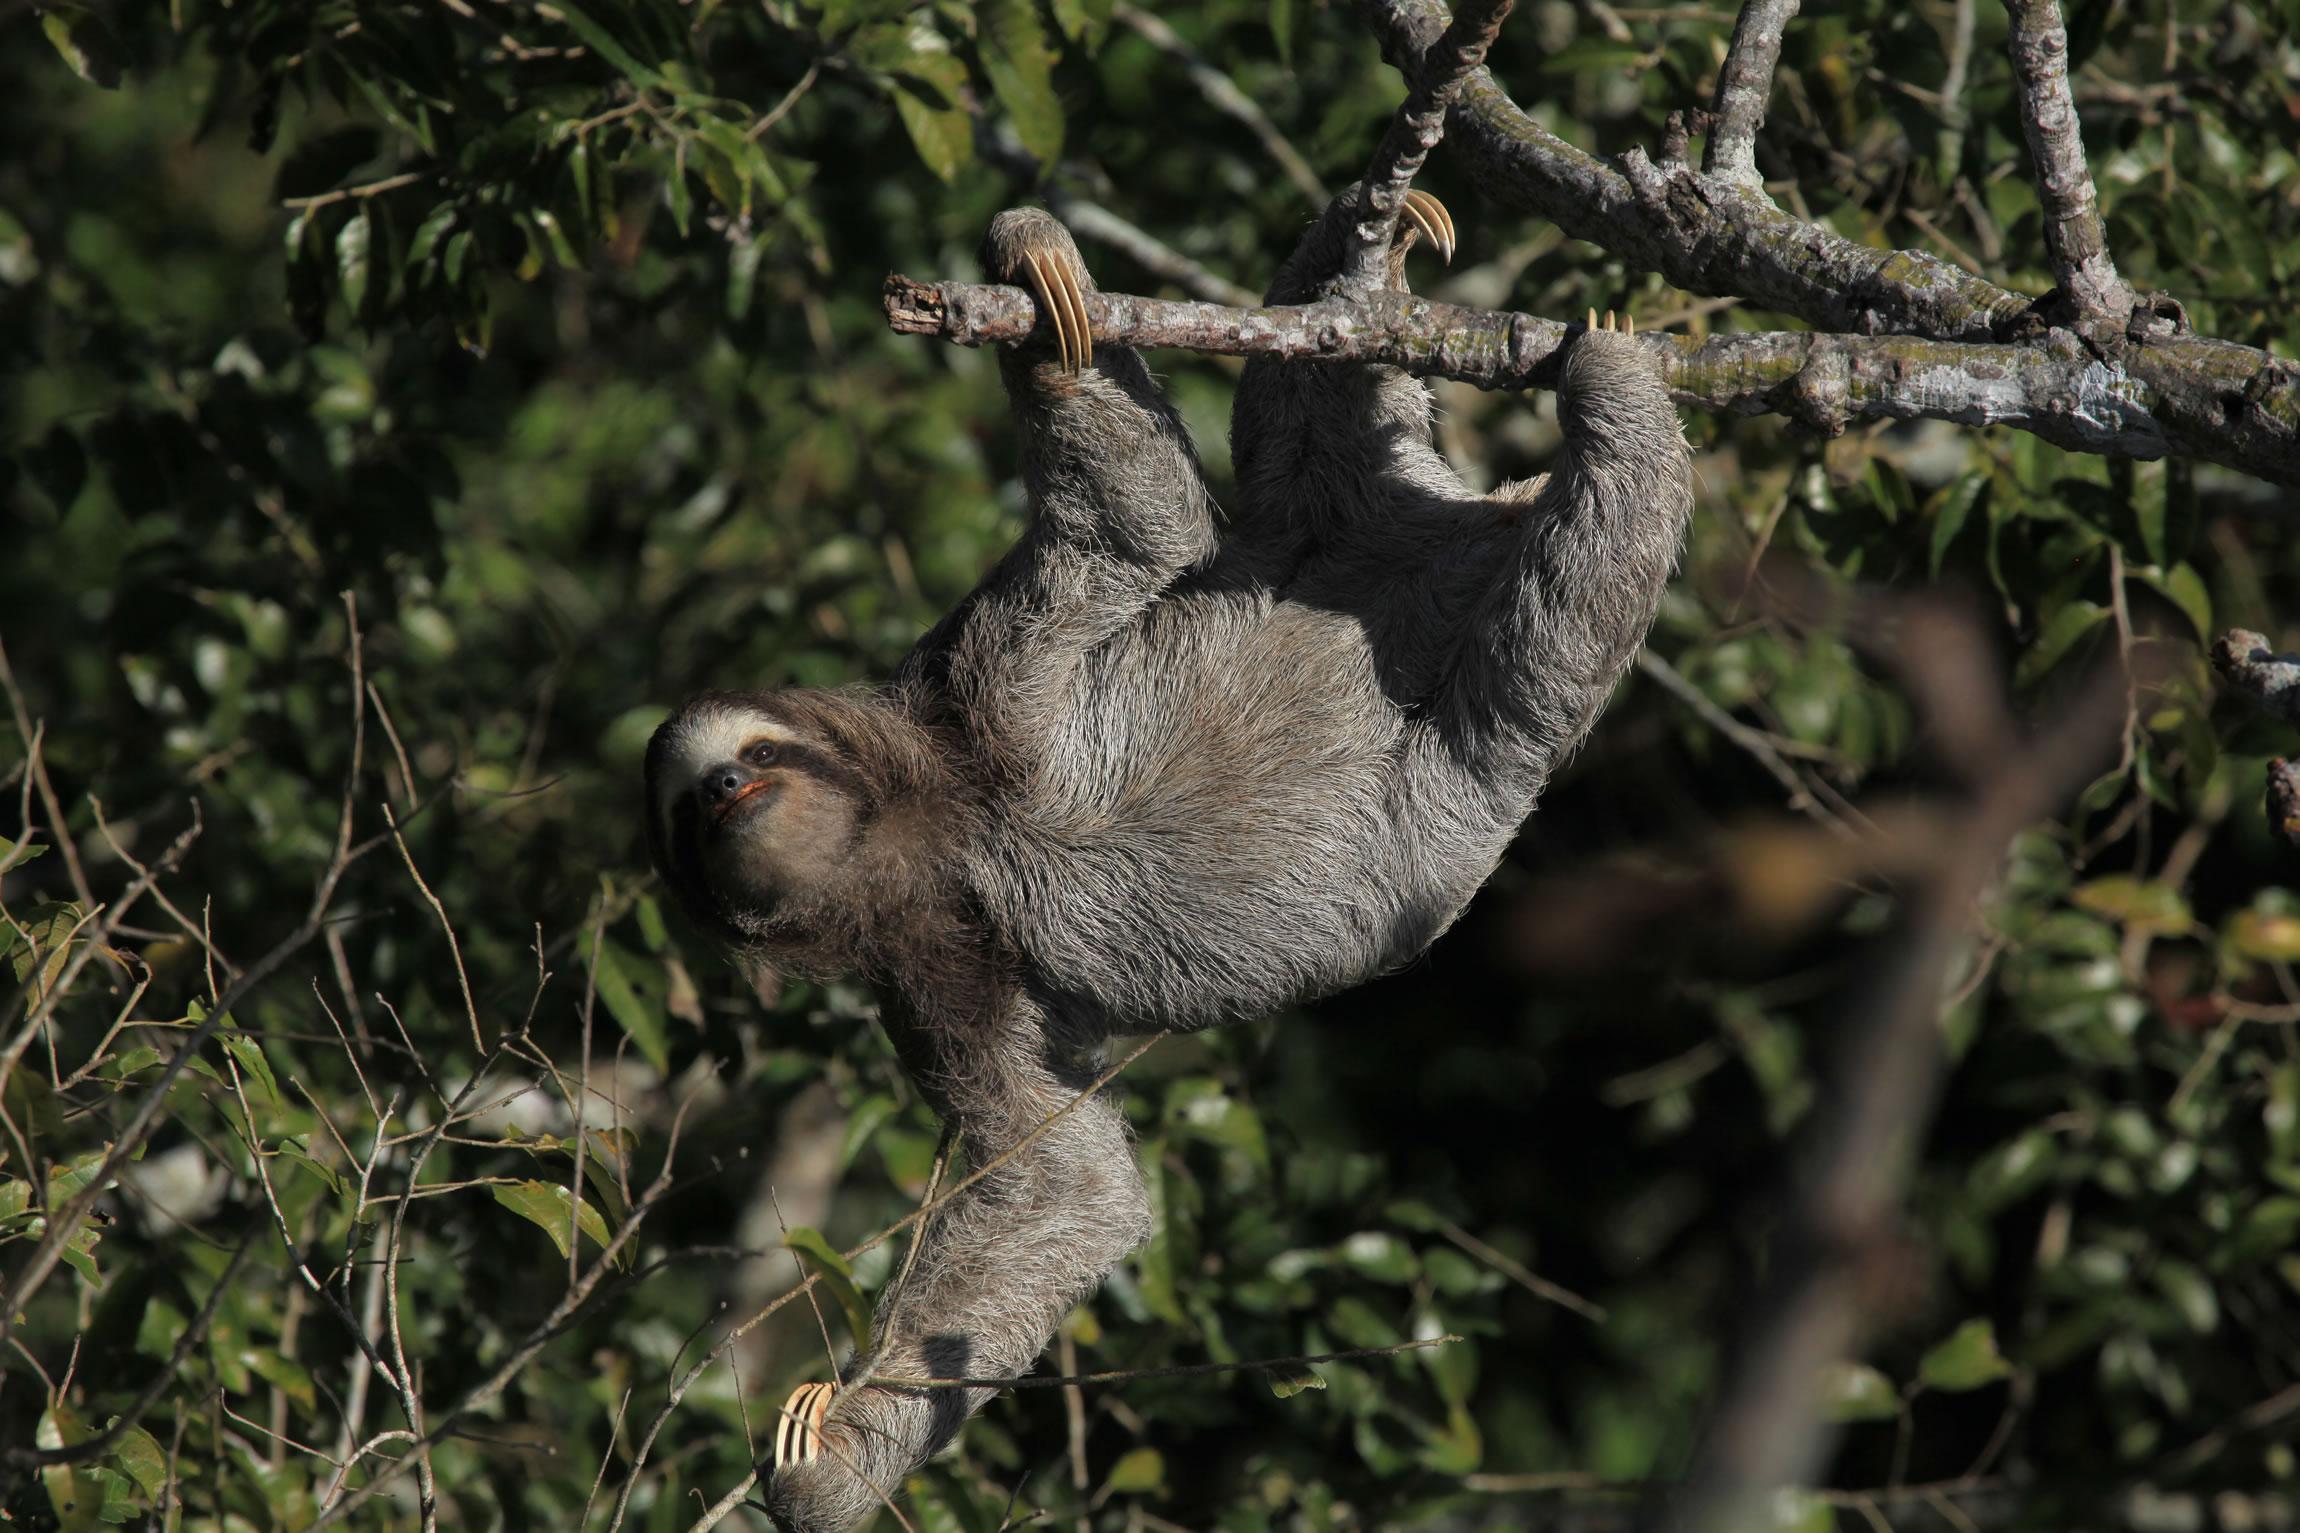 Pygmy Sloth of Panama